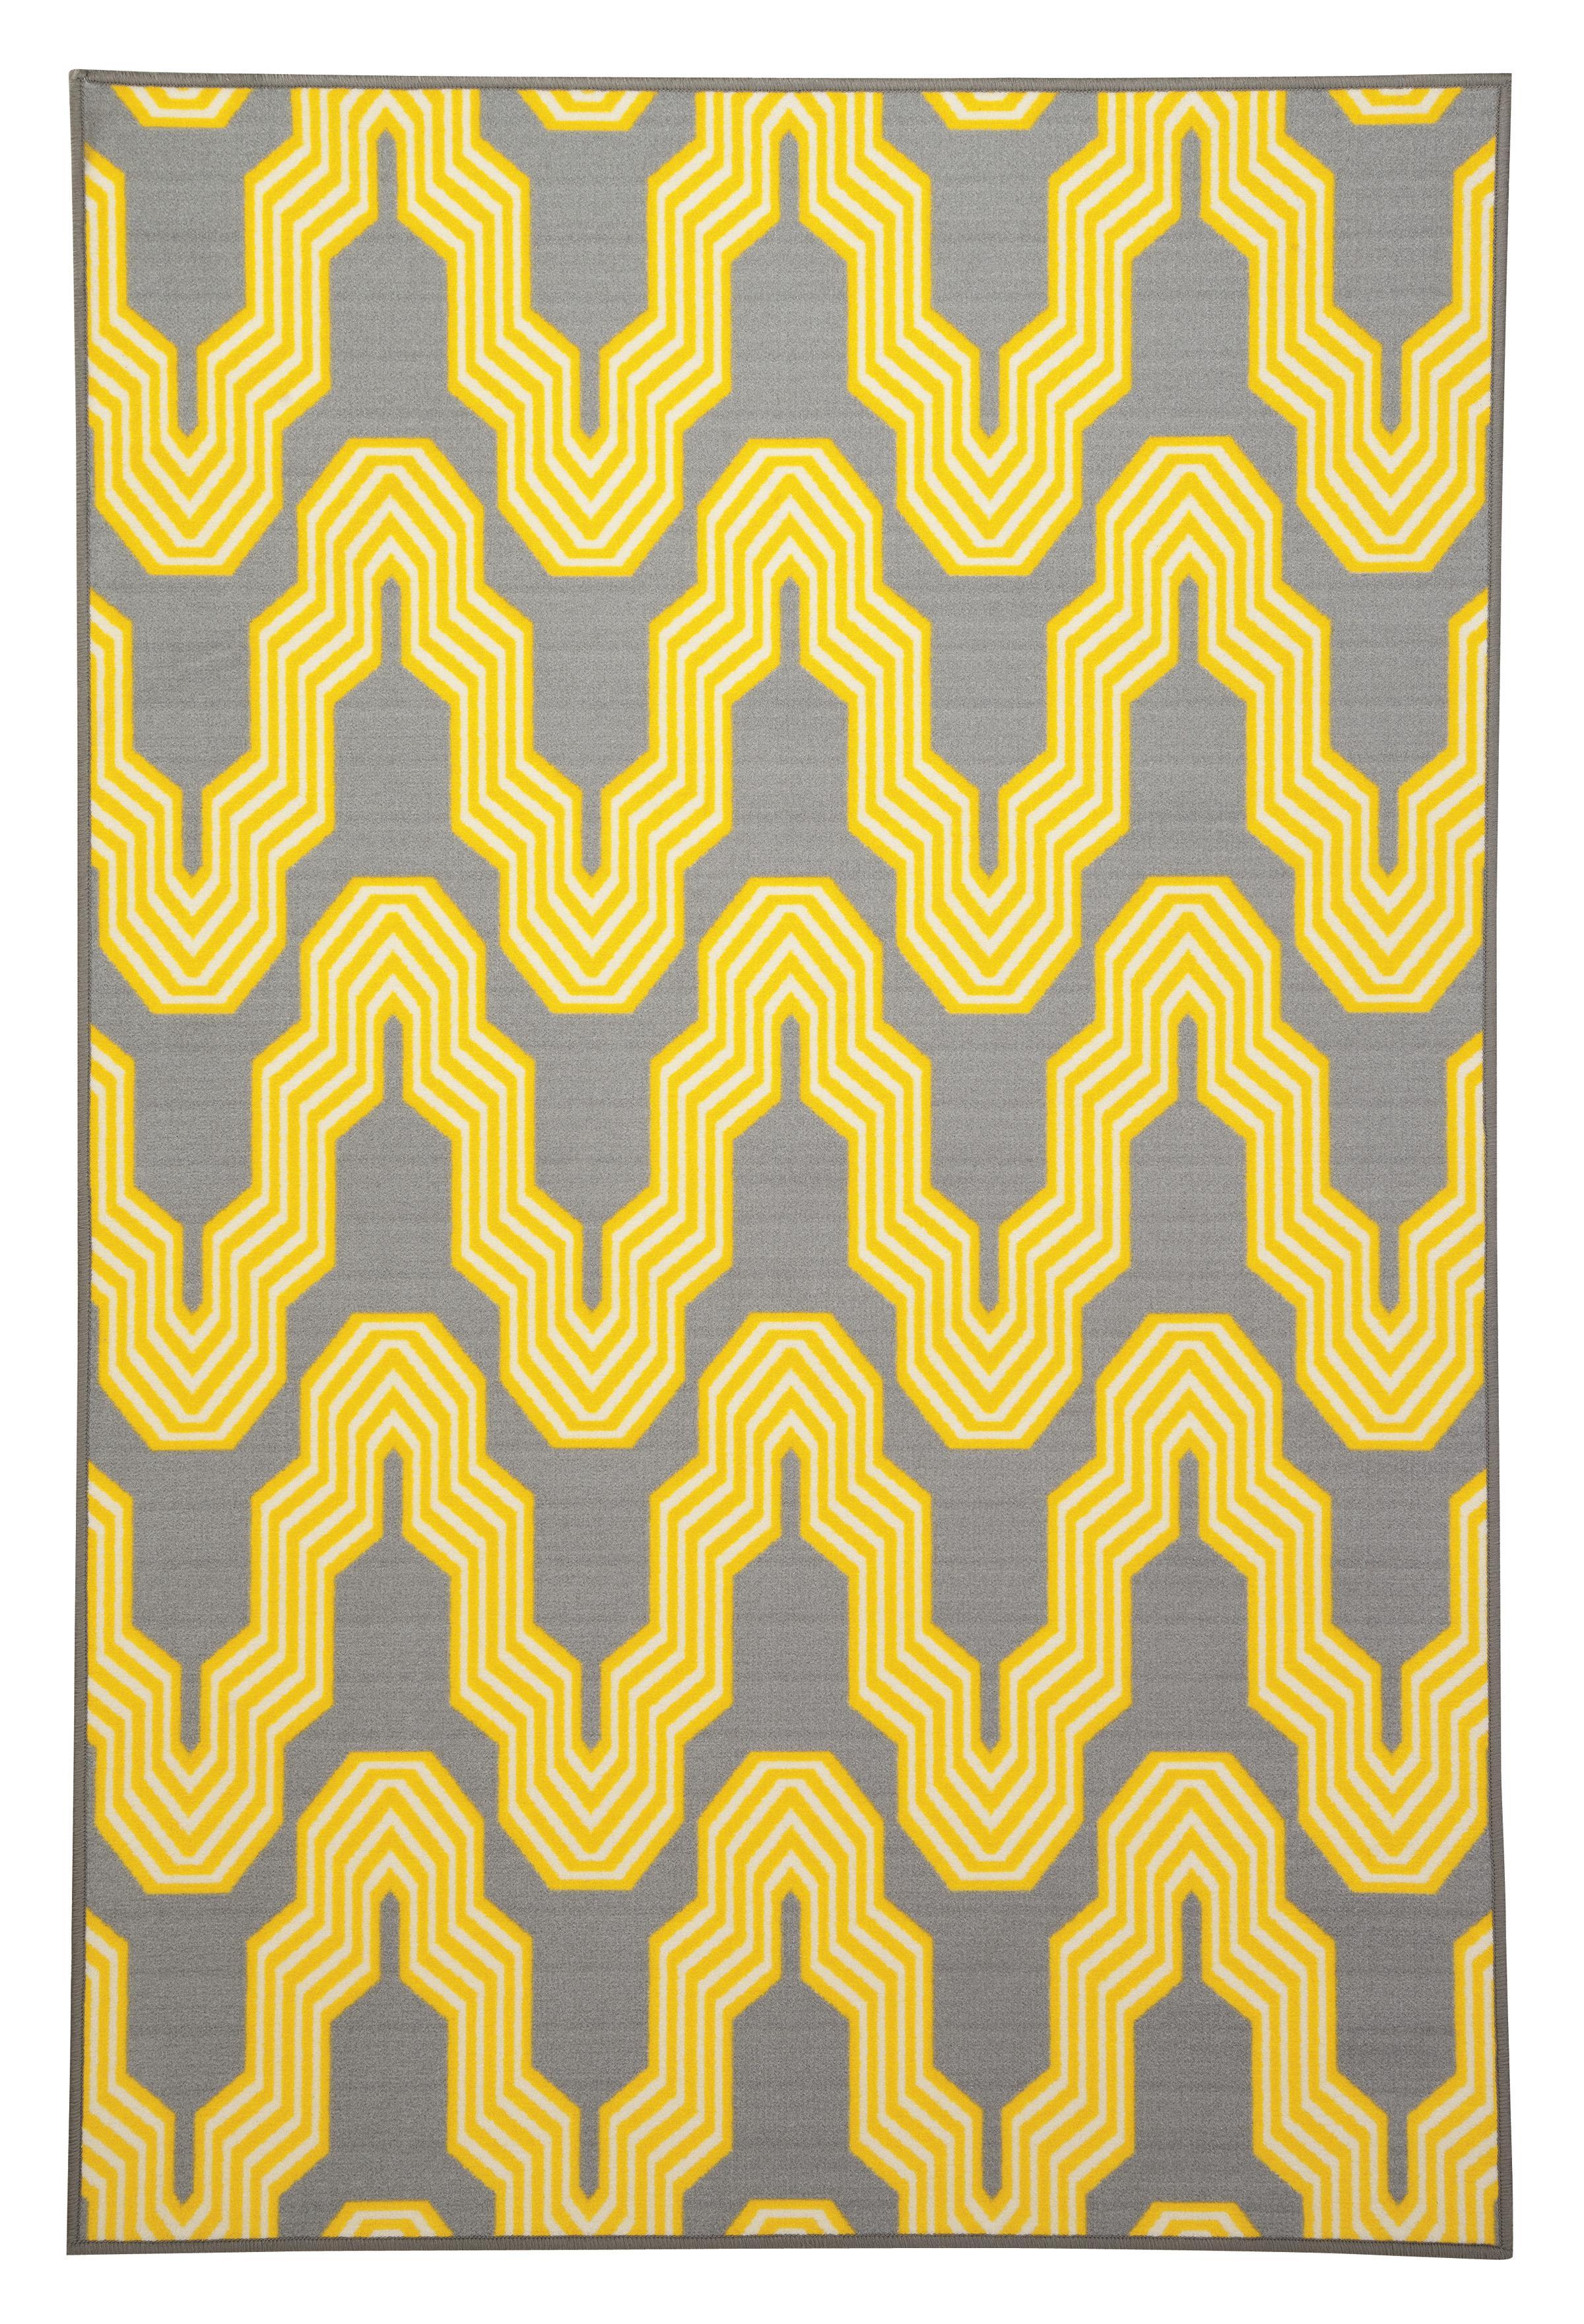 Signature Design by Ashley Transitional Area Rugs Nimat Yellow Medium Rug - Item Number: R326002